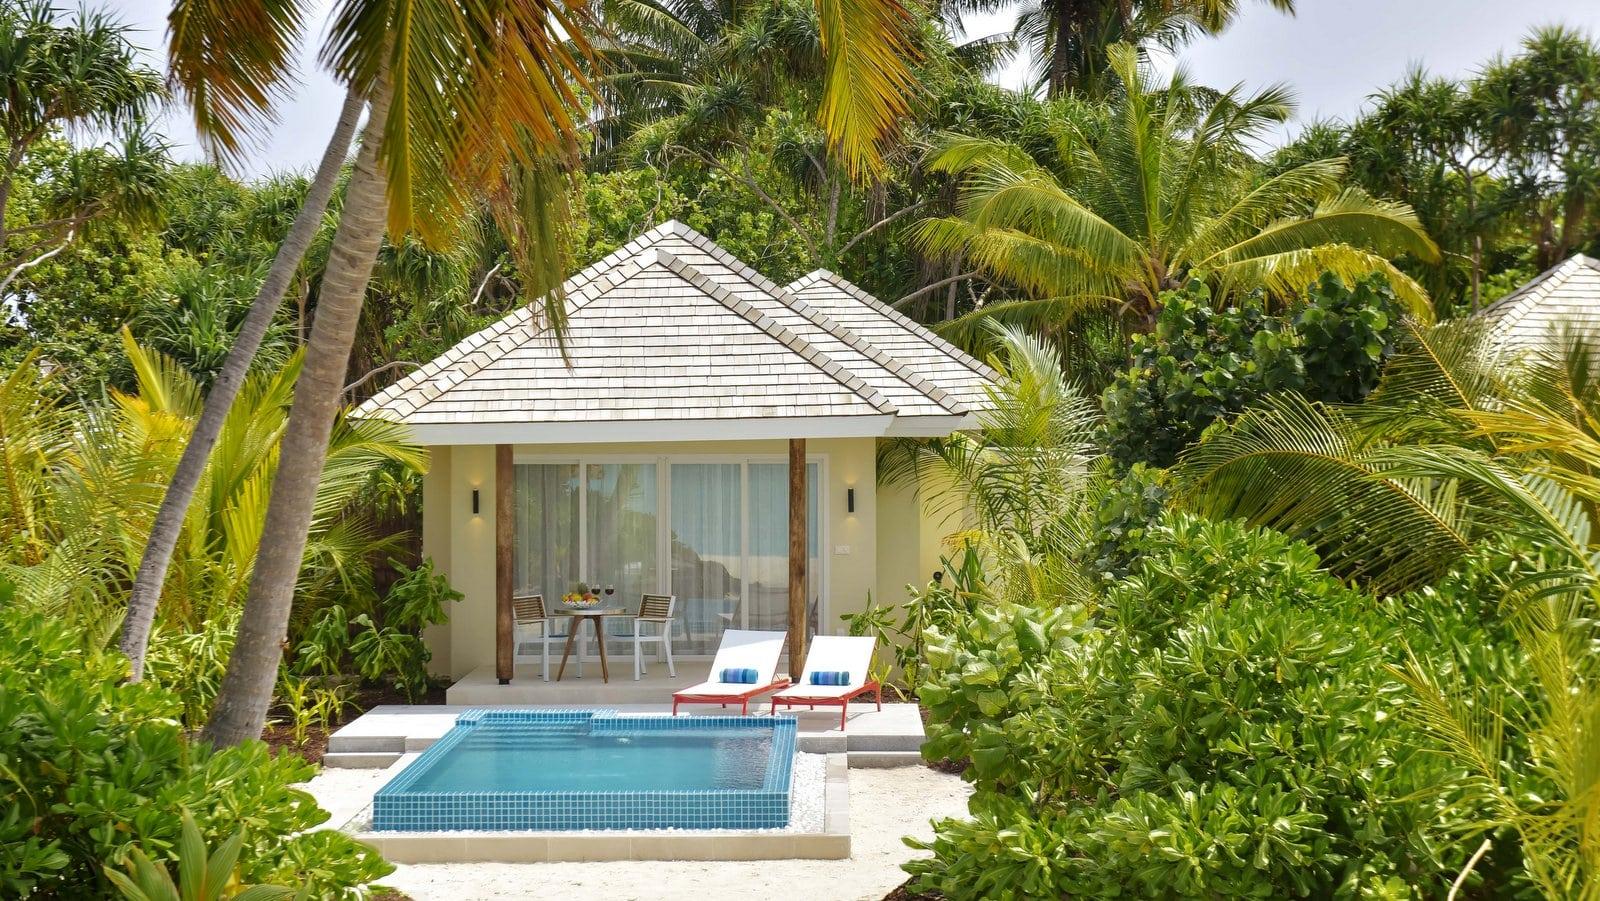 Мальдивы, отель Kandima Maldives, номер Beach Pool Villa with Jacuzzi